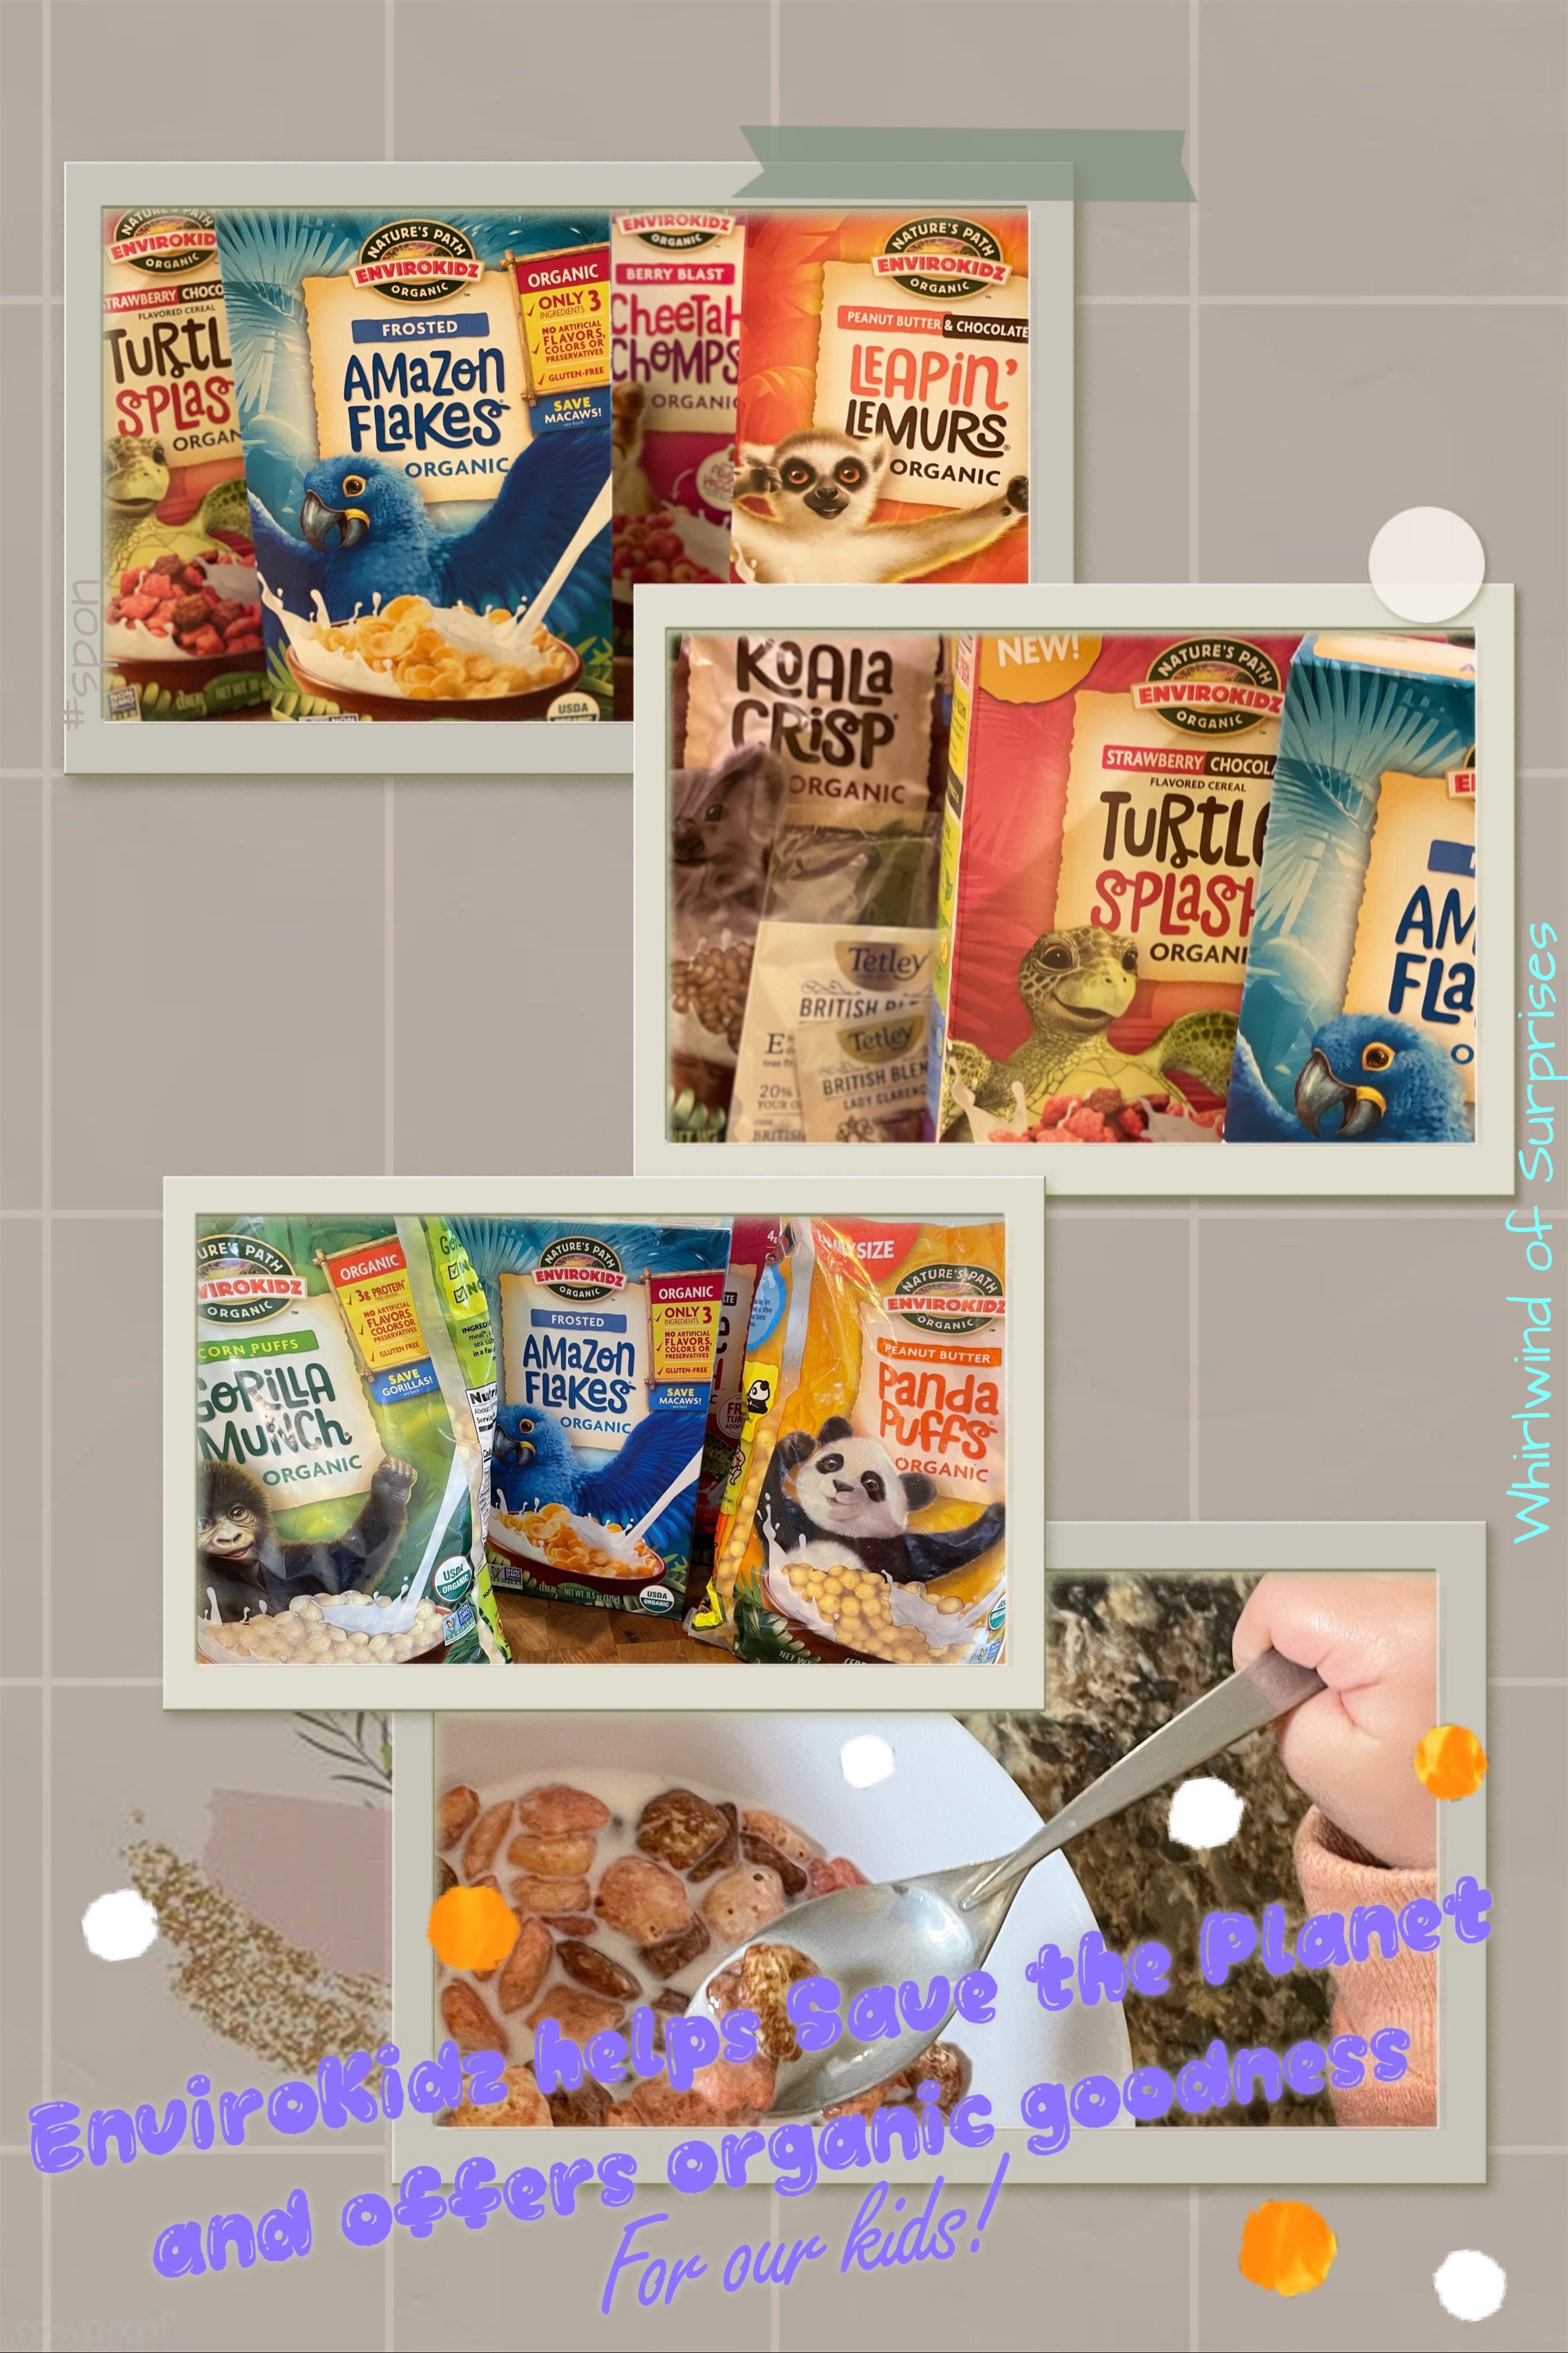 Organic Breakfast options for kids